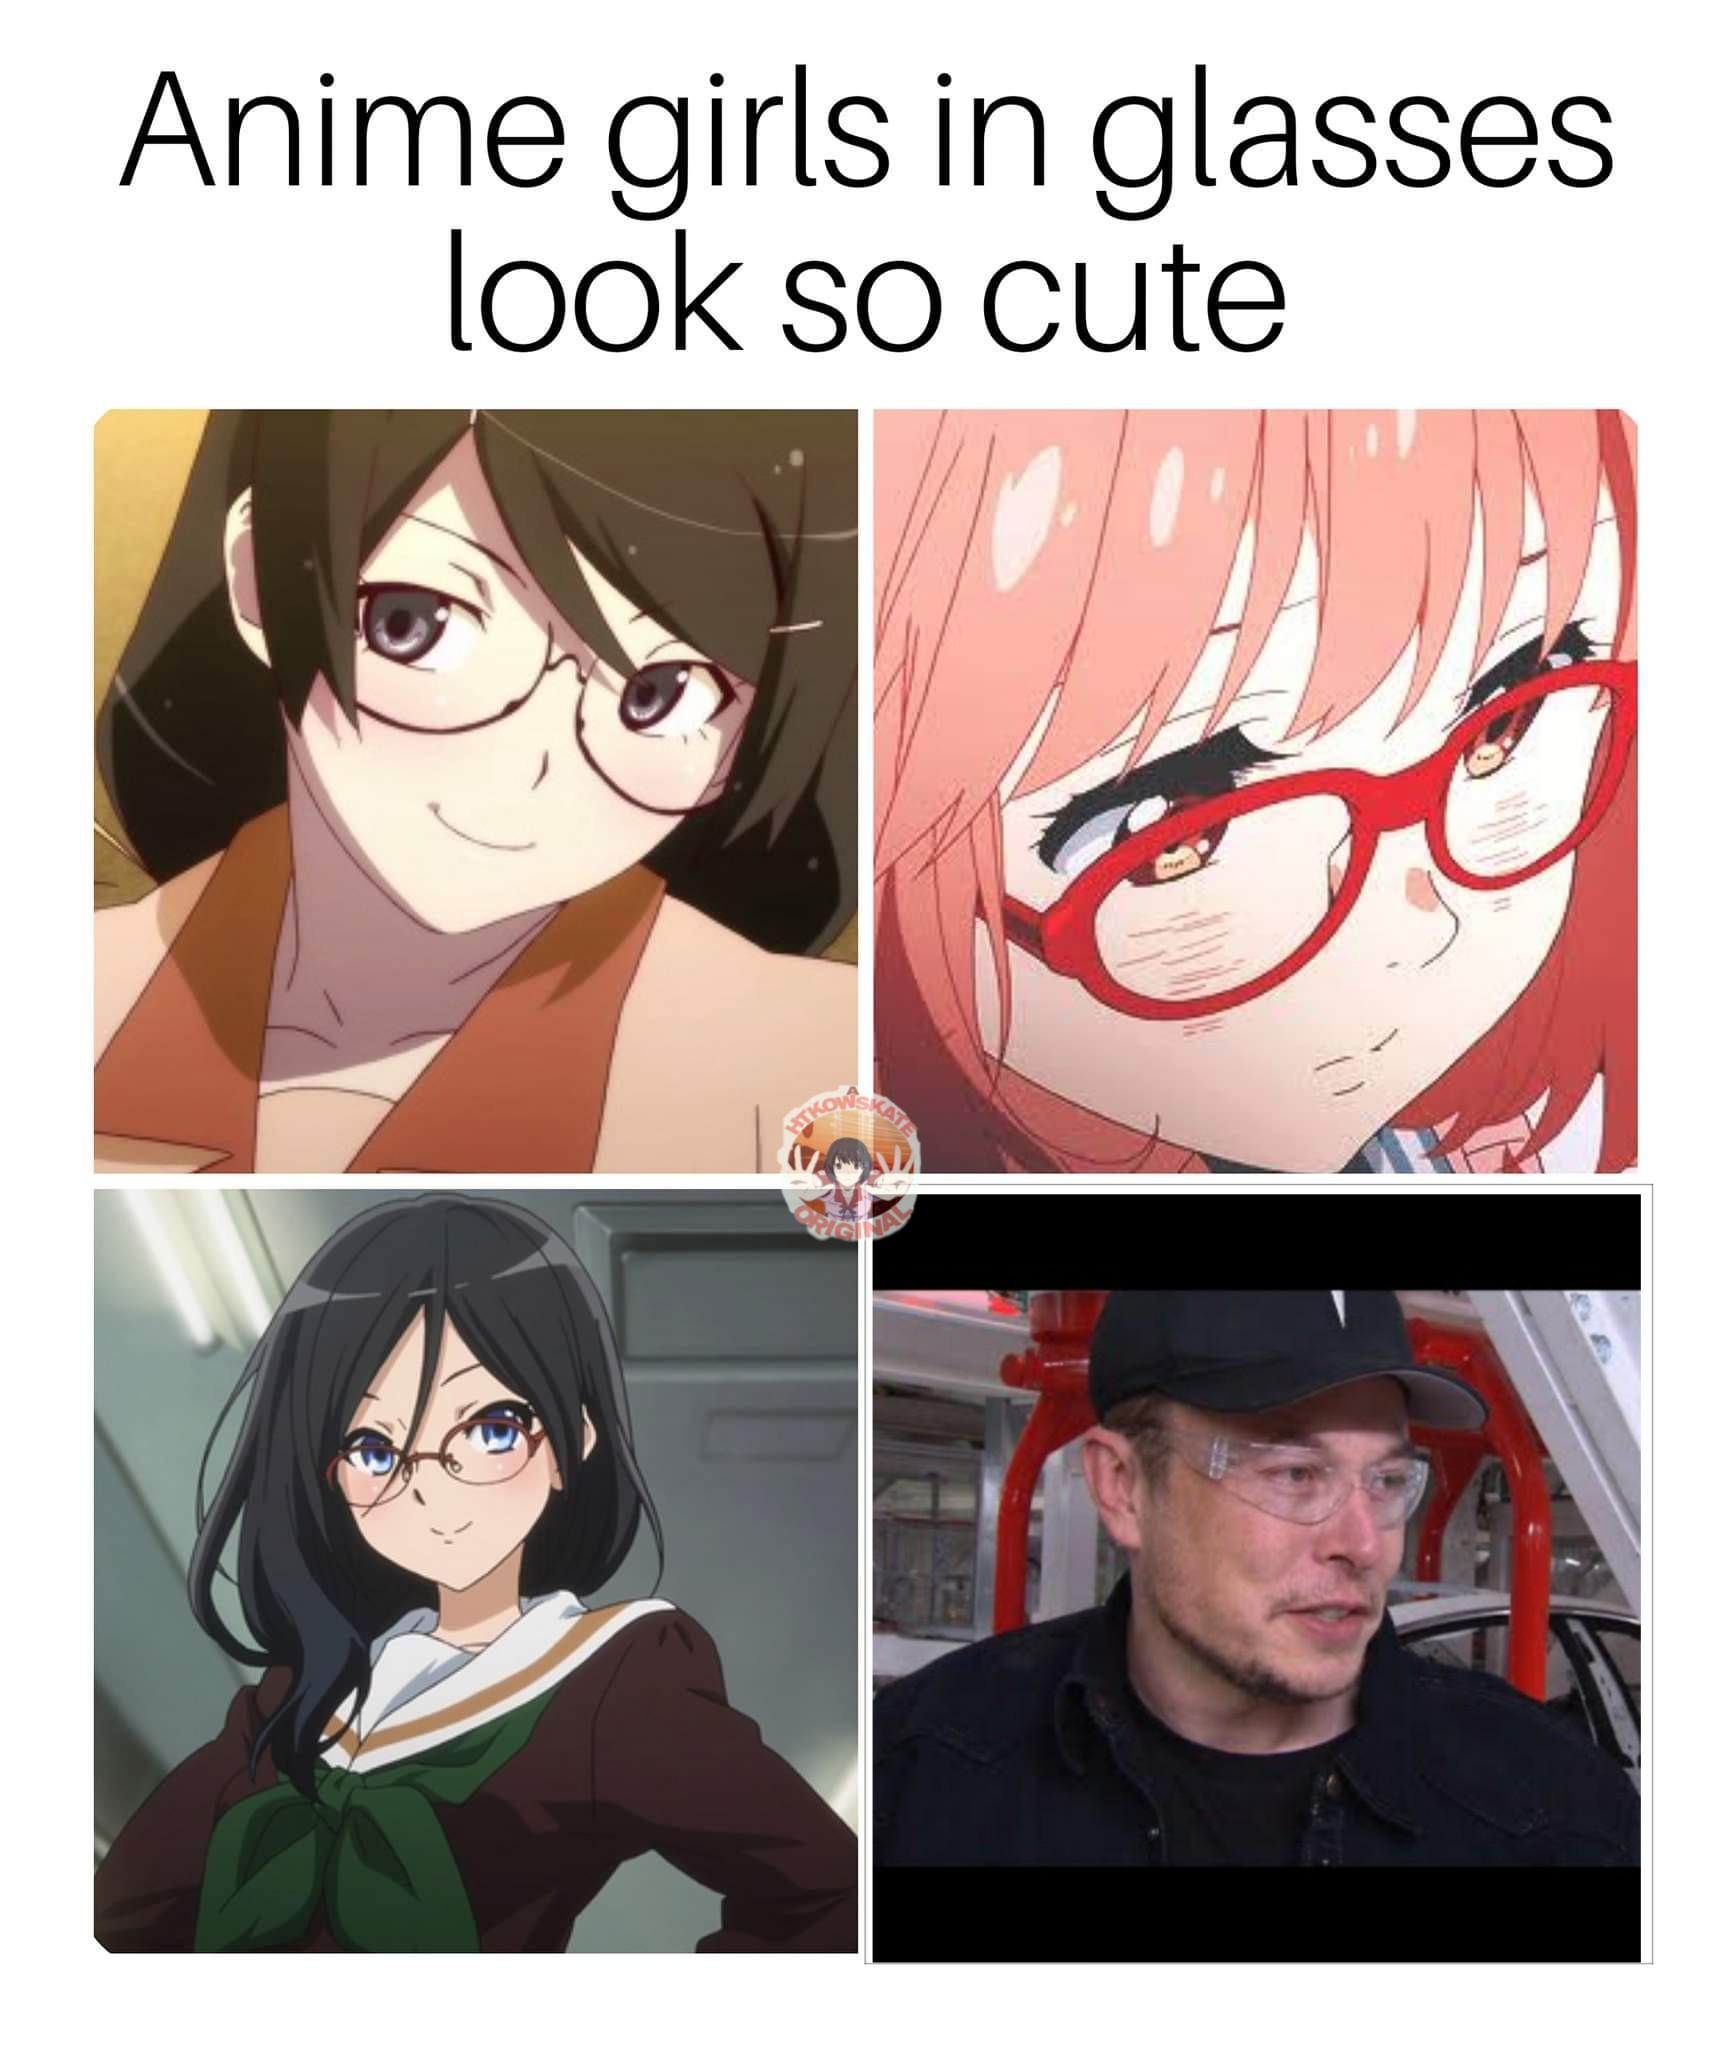 Anime girls in glasses look so cute